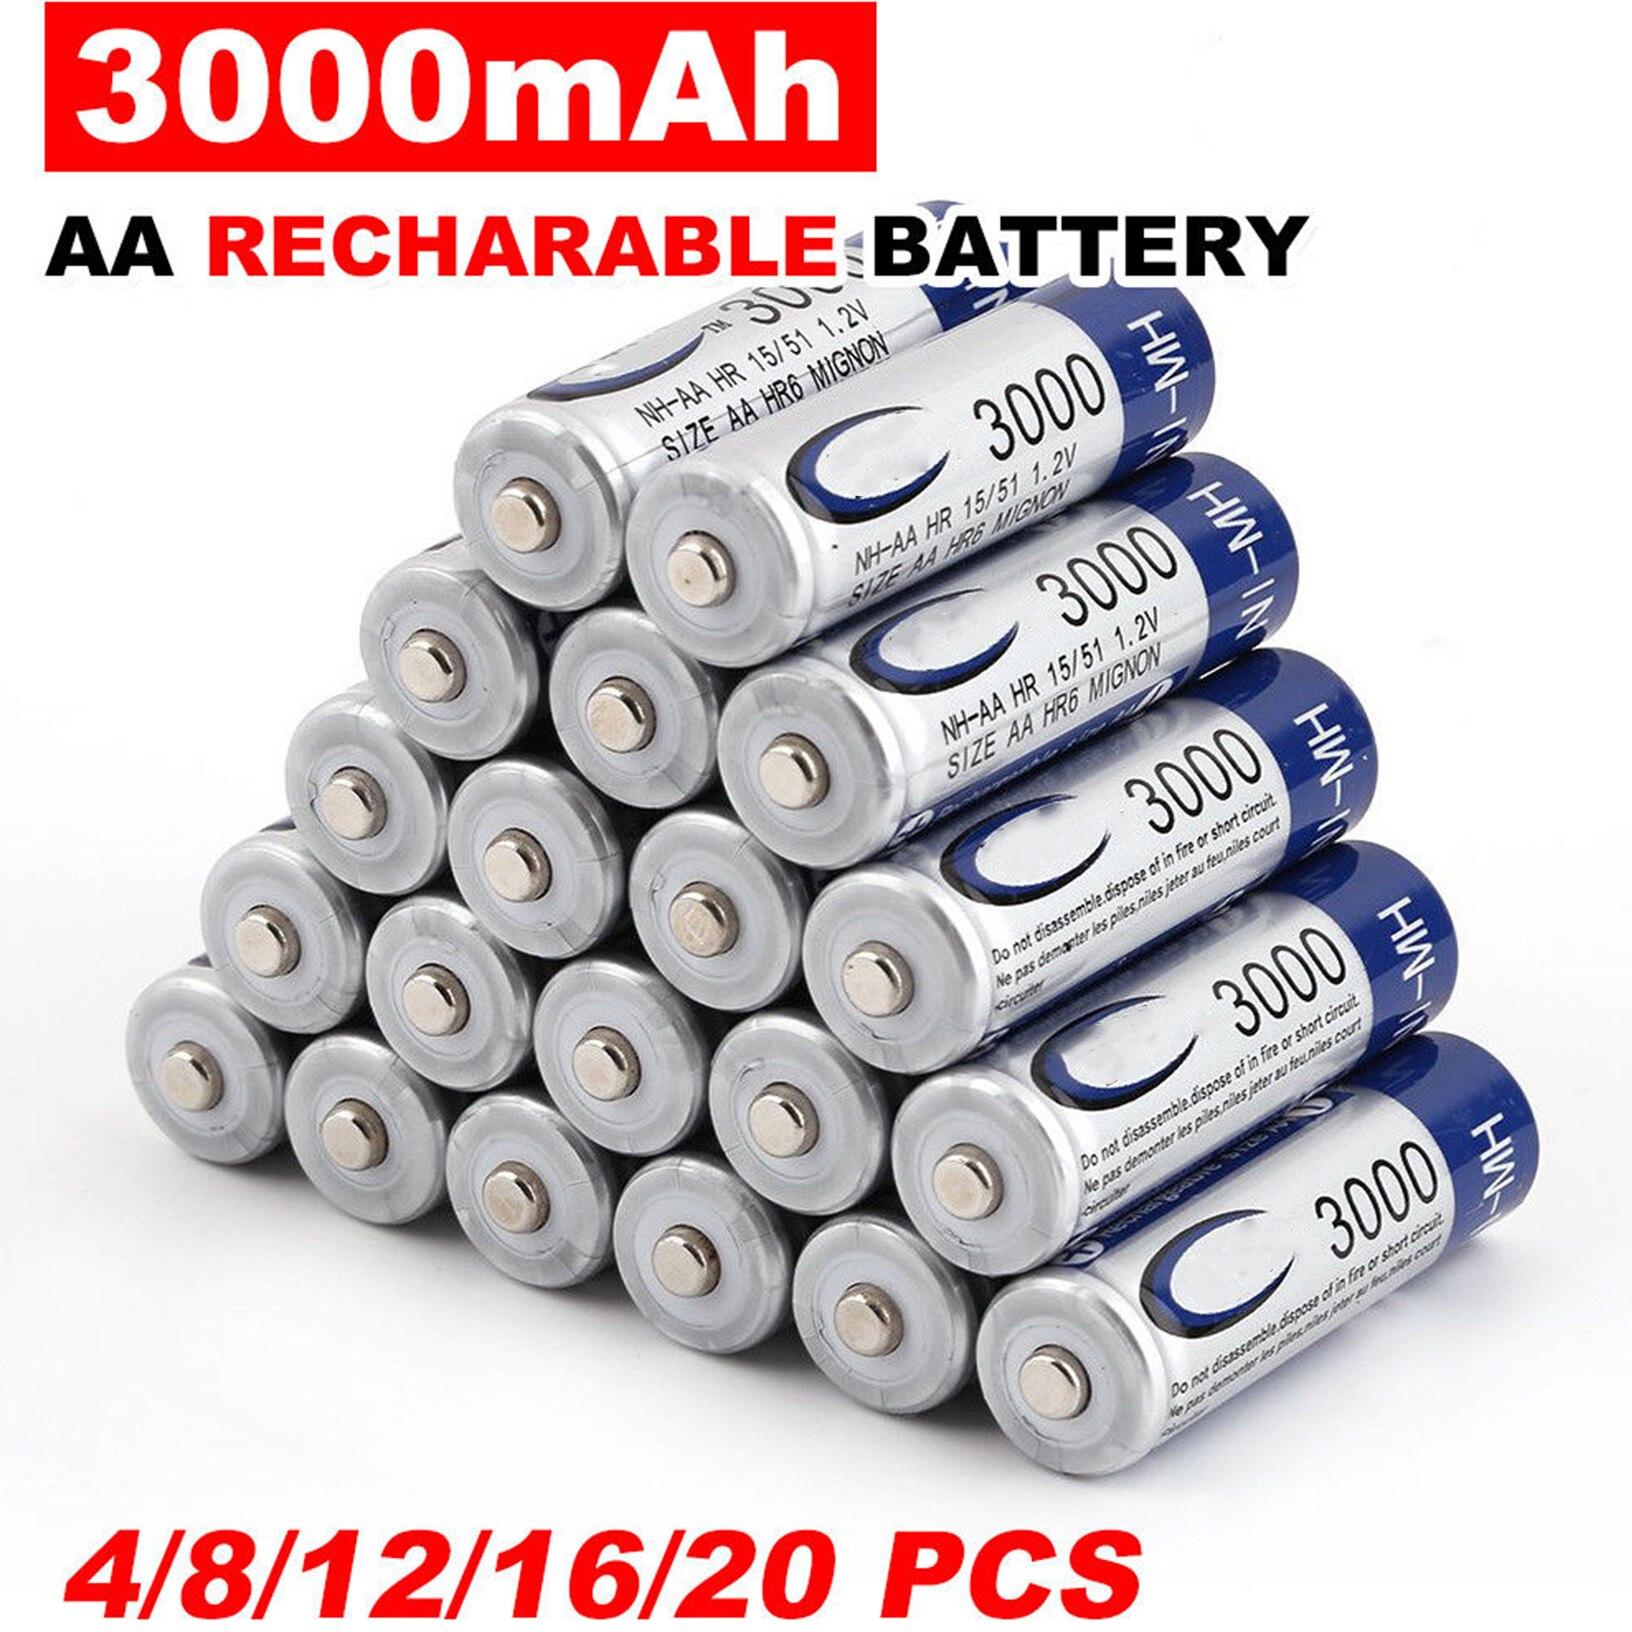 4-50pcs 3000mAh AA 2A NI-MH 1.2V Rechargeable Battery Recharge Pre-Charged Ni-MH Rechargeable Battery For Toys Camera Microphone